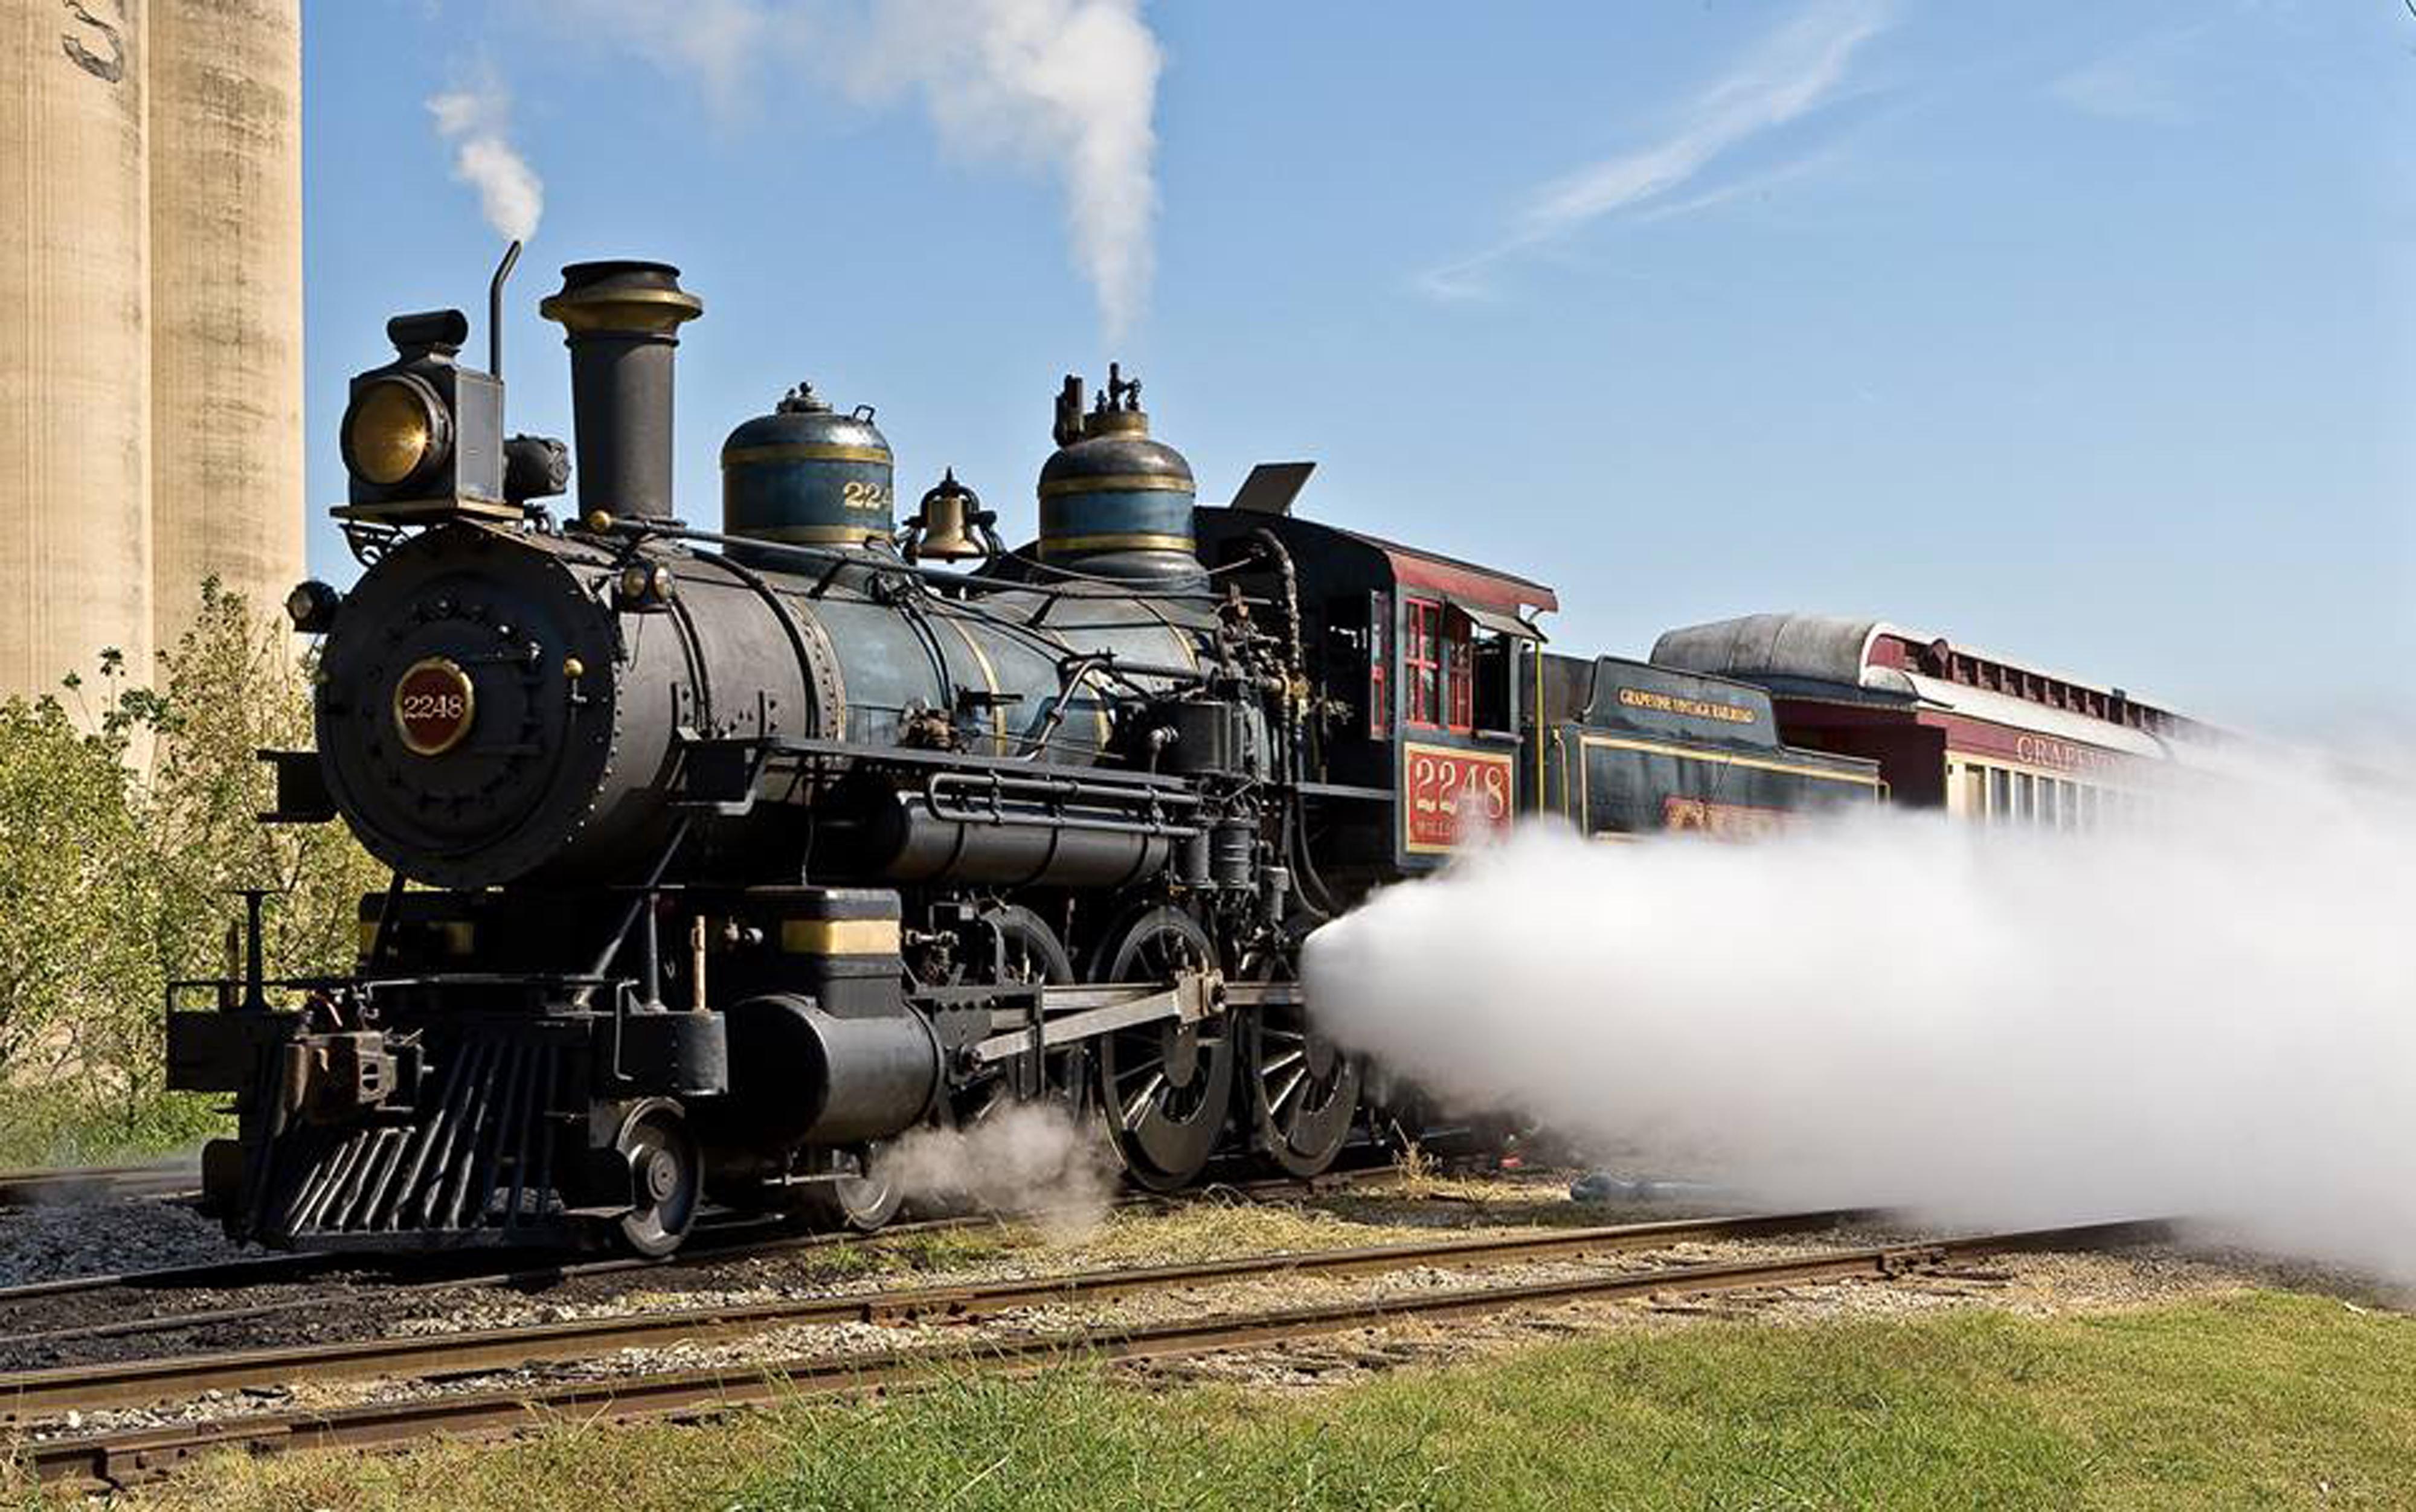 All Aboard the Grapevine Vintage Railroad